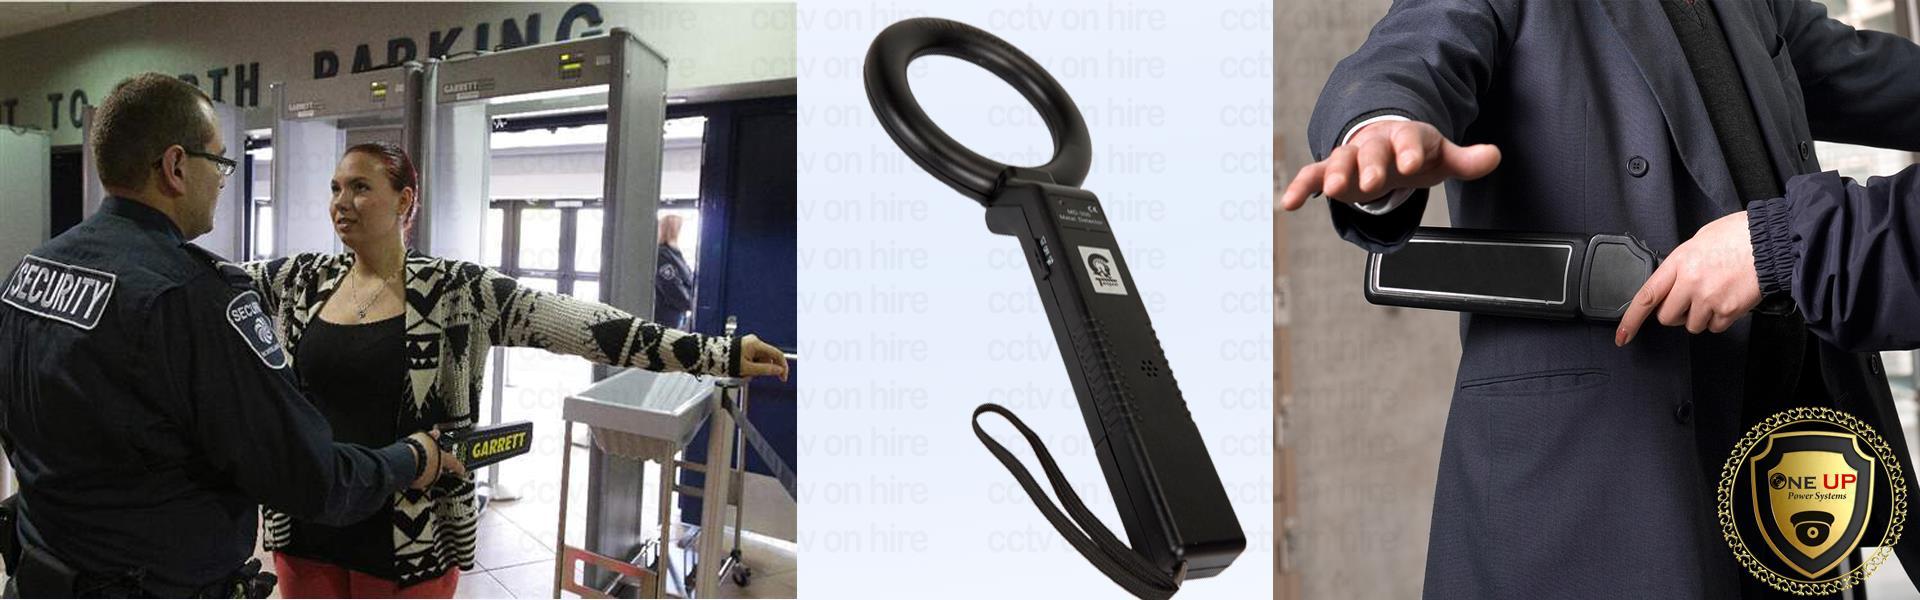 Hand-held metal detector company